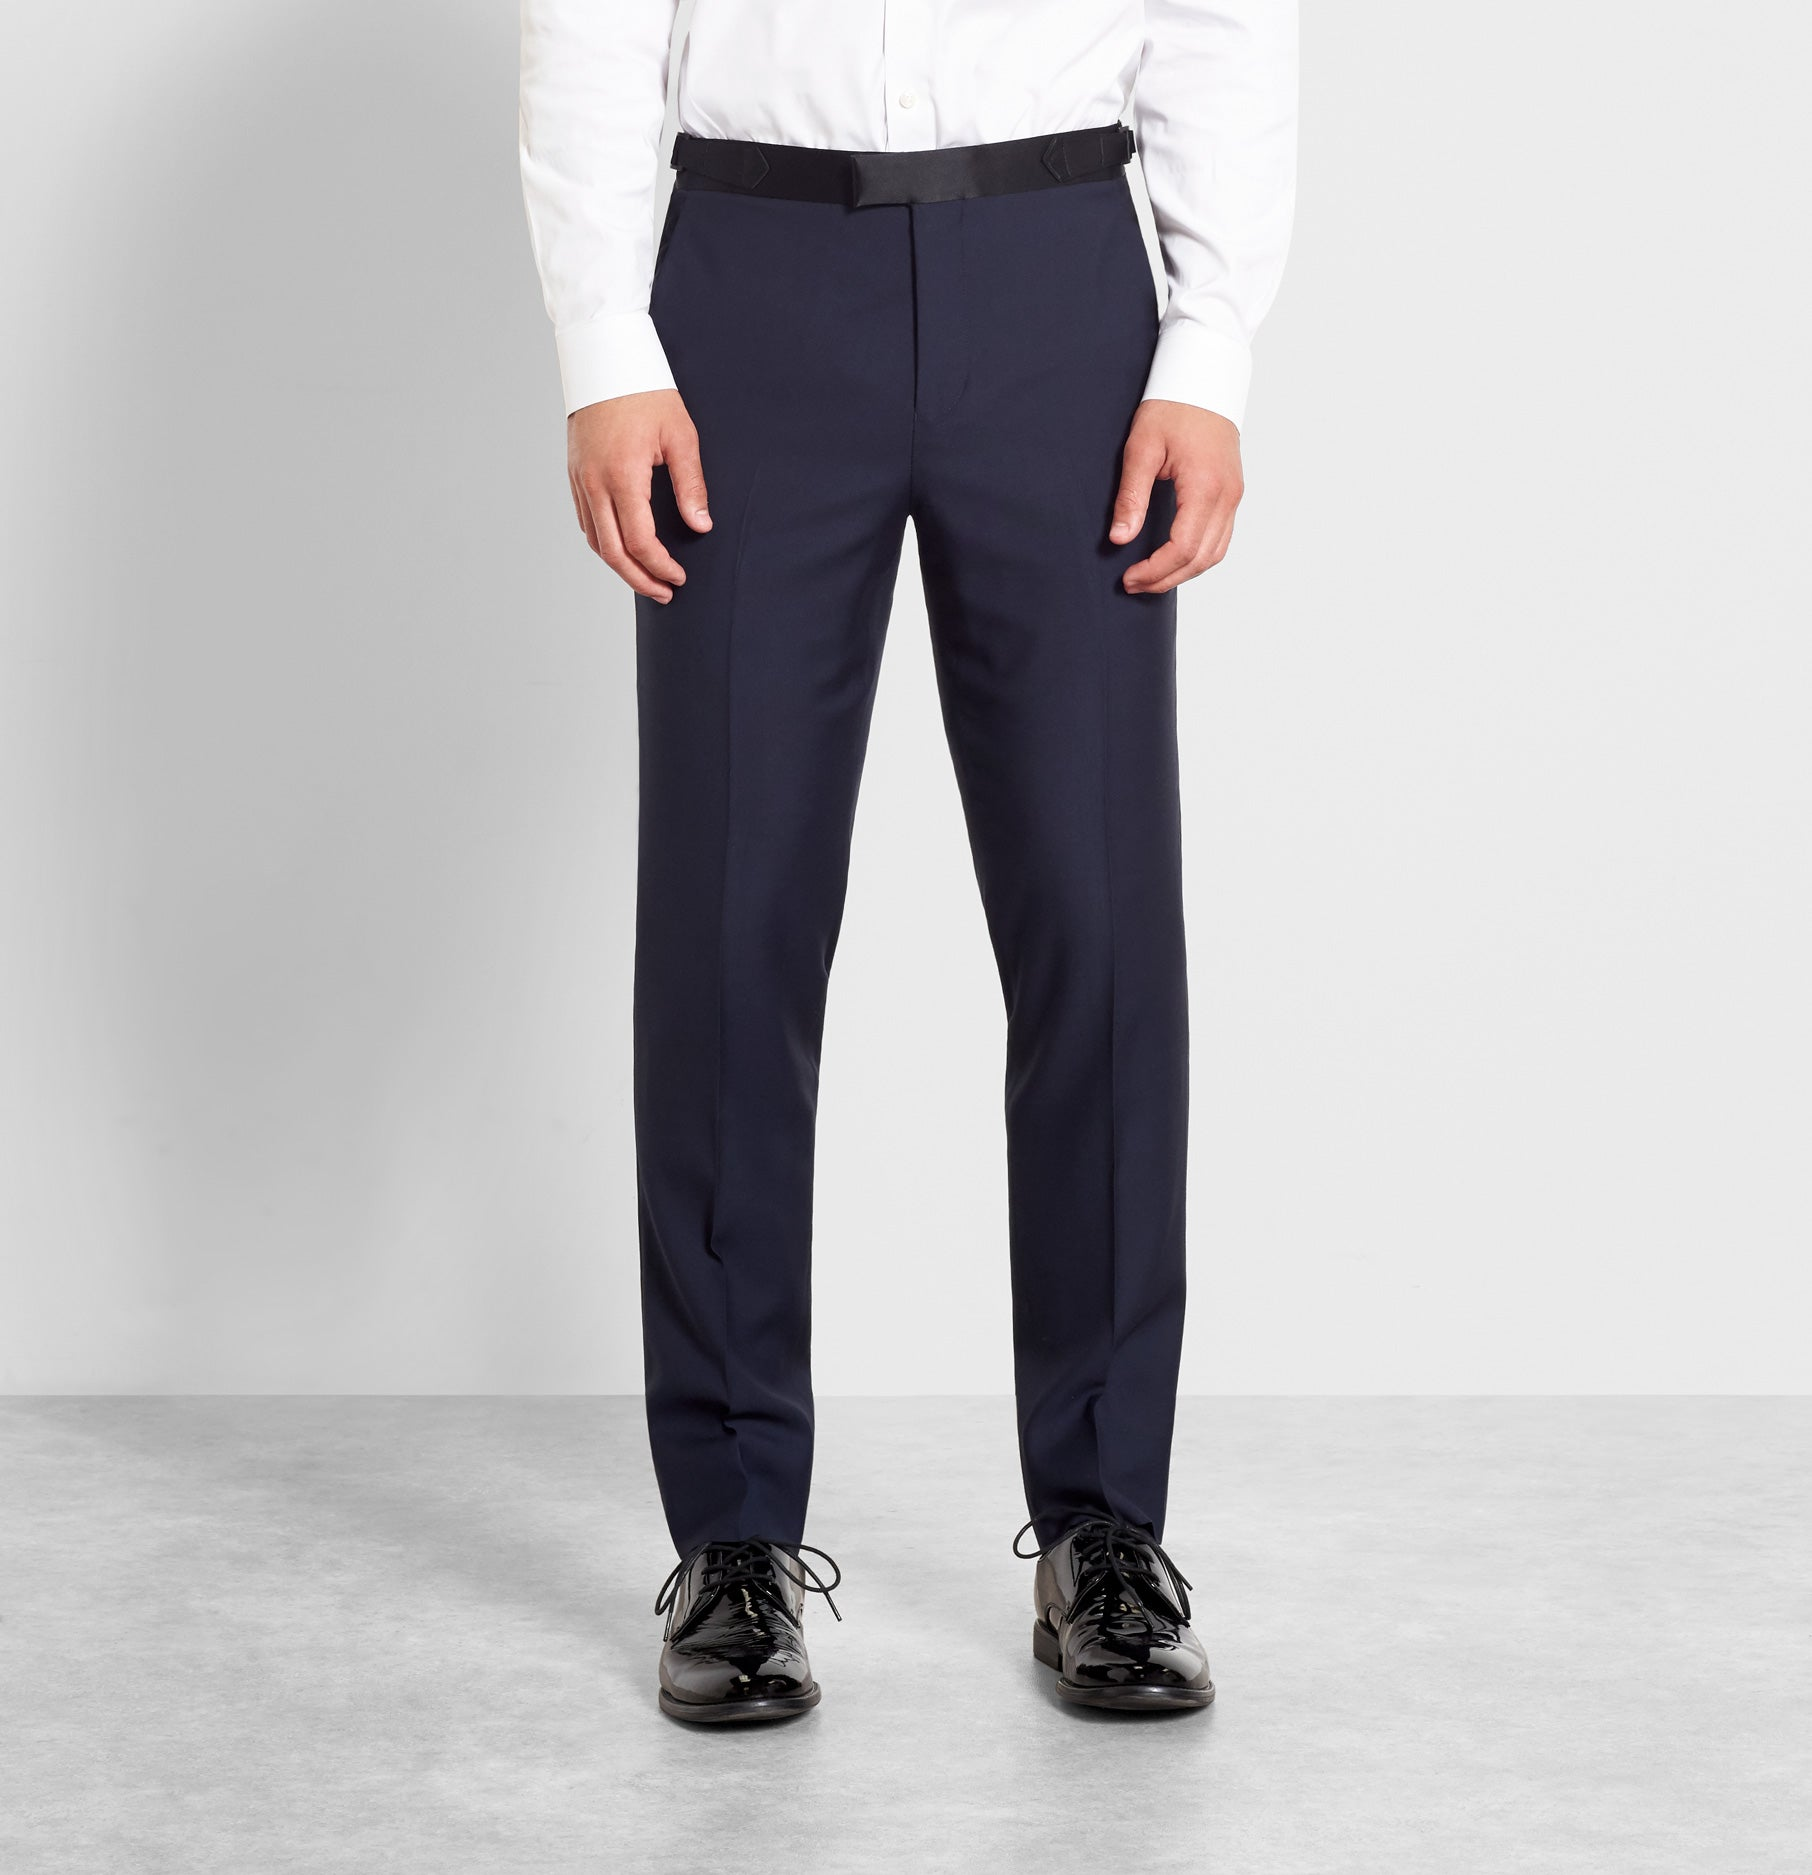 0801d6cceb2 Midnight Blue Tuxedo | The Black Tux